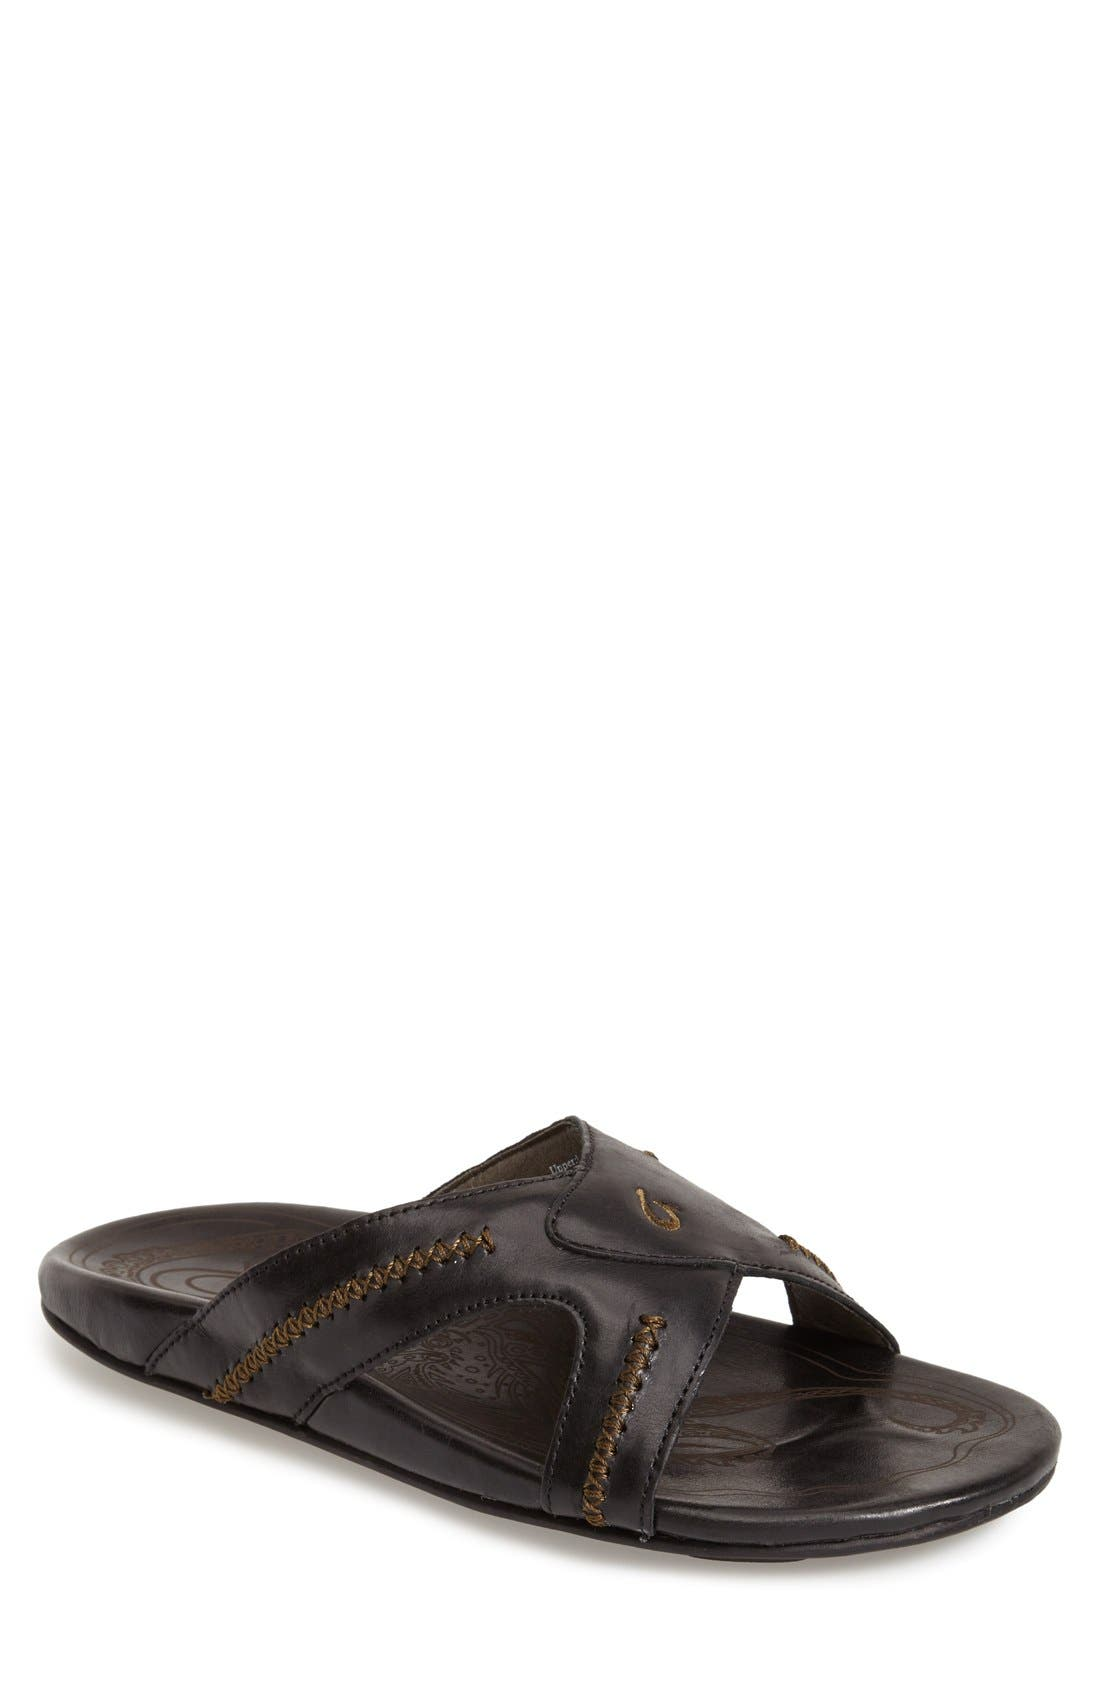 Alternate Image 1 Selected - OluKai 'Mea Ola' Slide Sandal (Men)